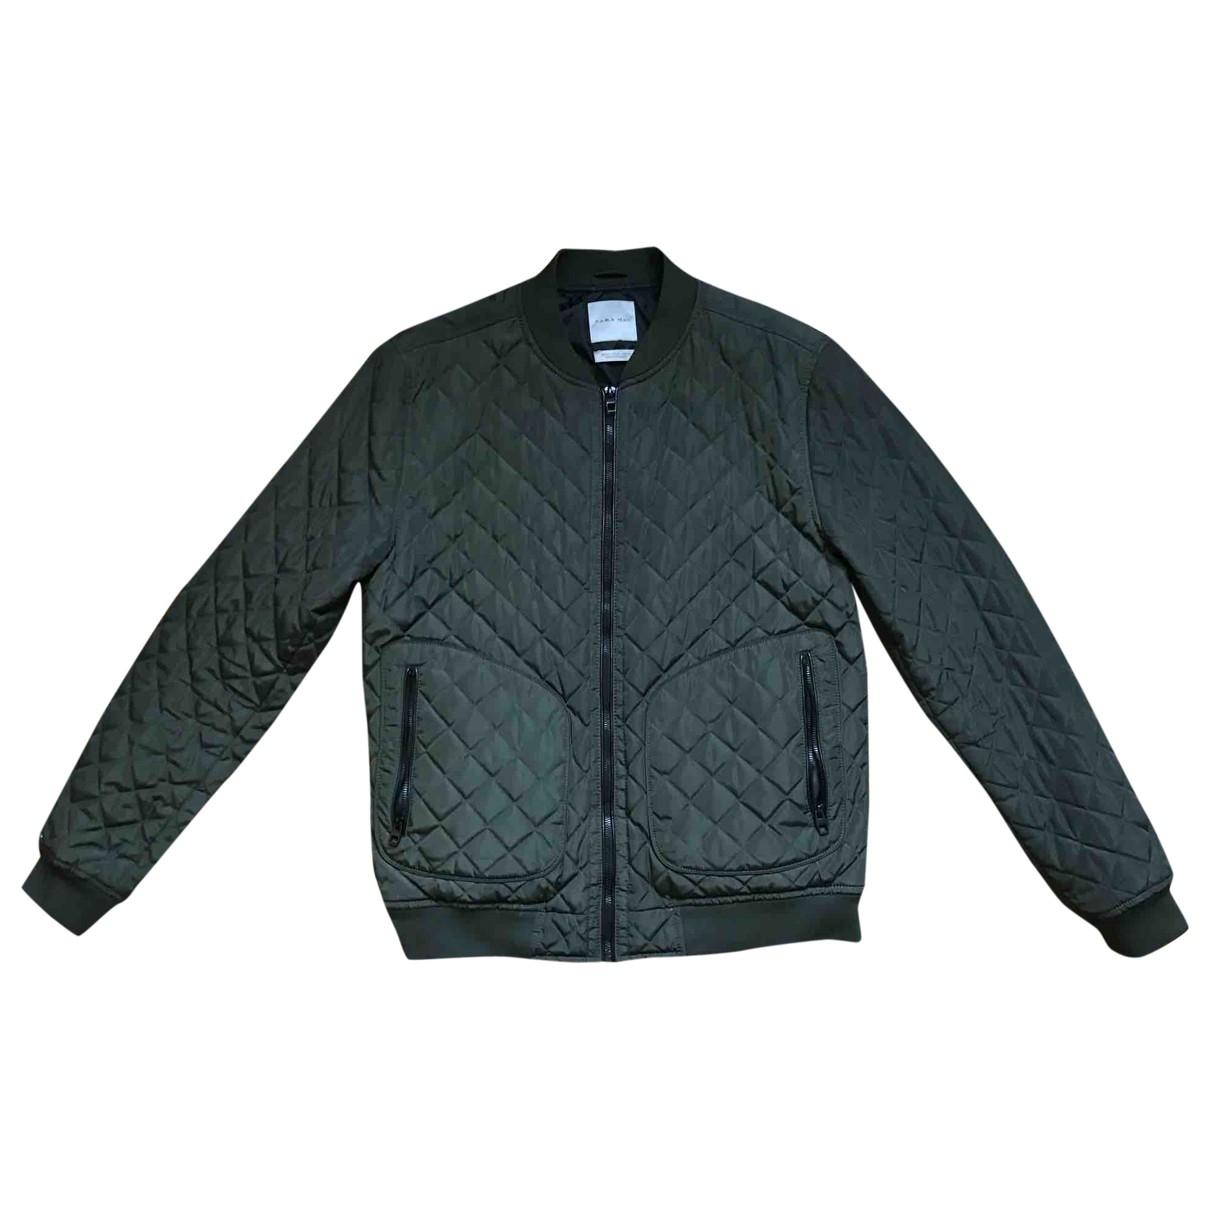 Zara \N Khaki jacket  for Men XL International